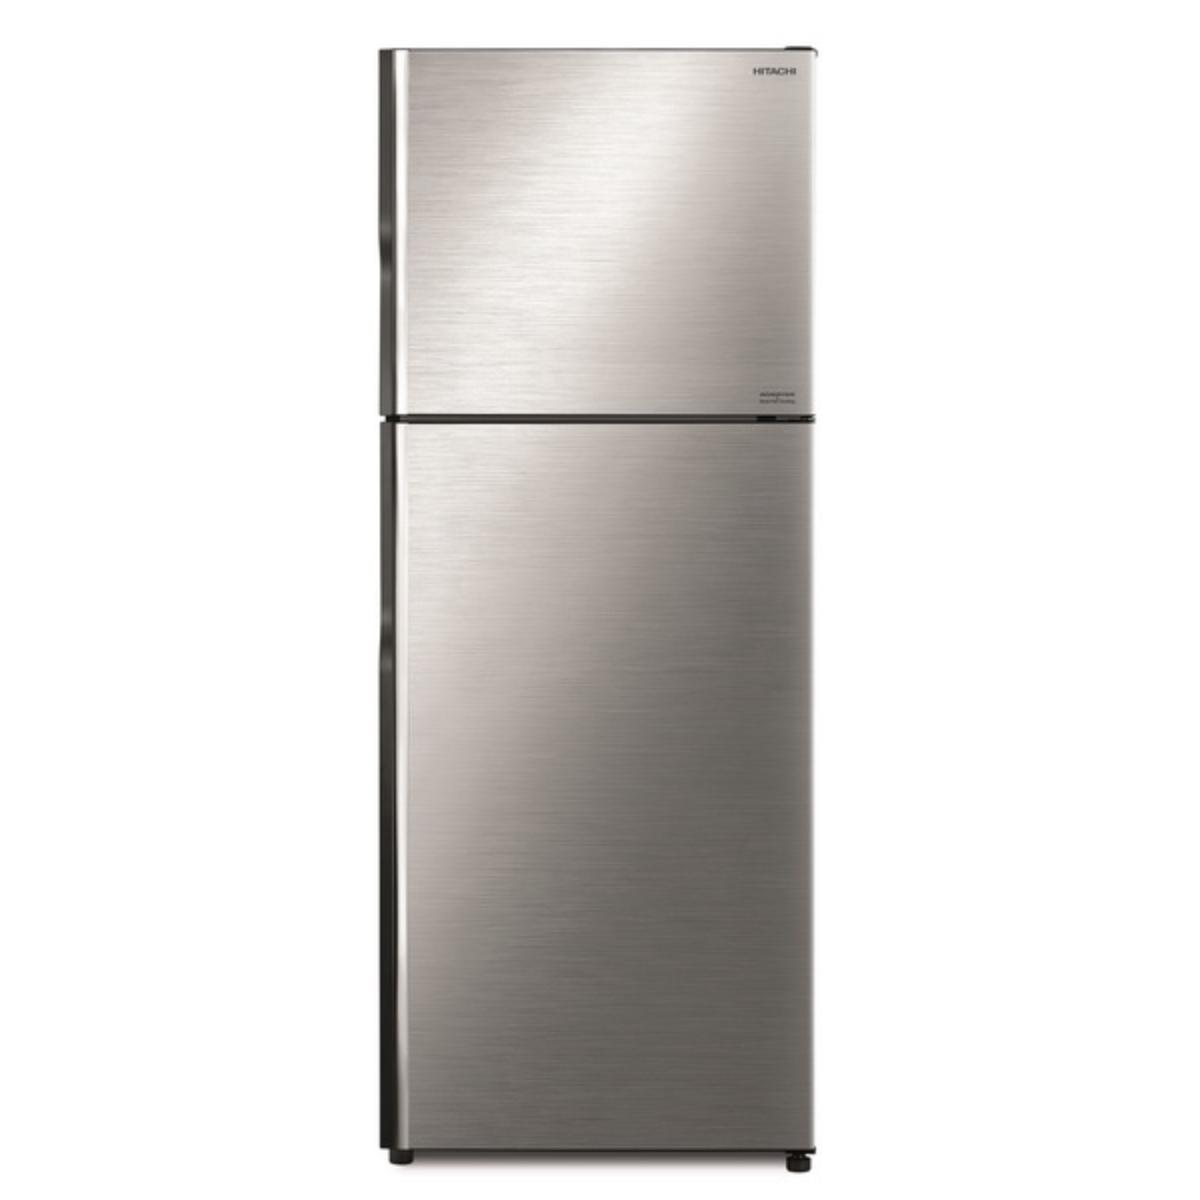 Hitachi Double Doors Refrigerator 15 Cubic Brilliant Silver R-VX400PF BSL